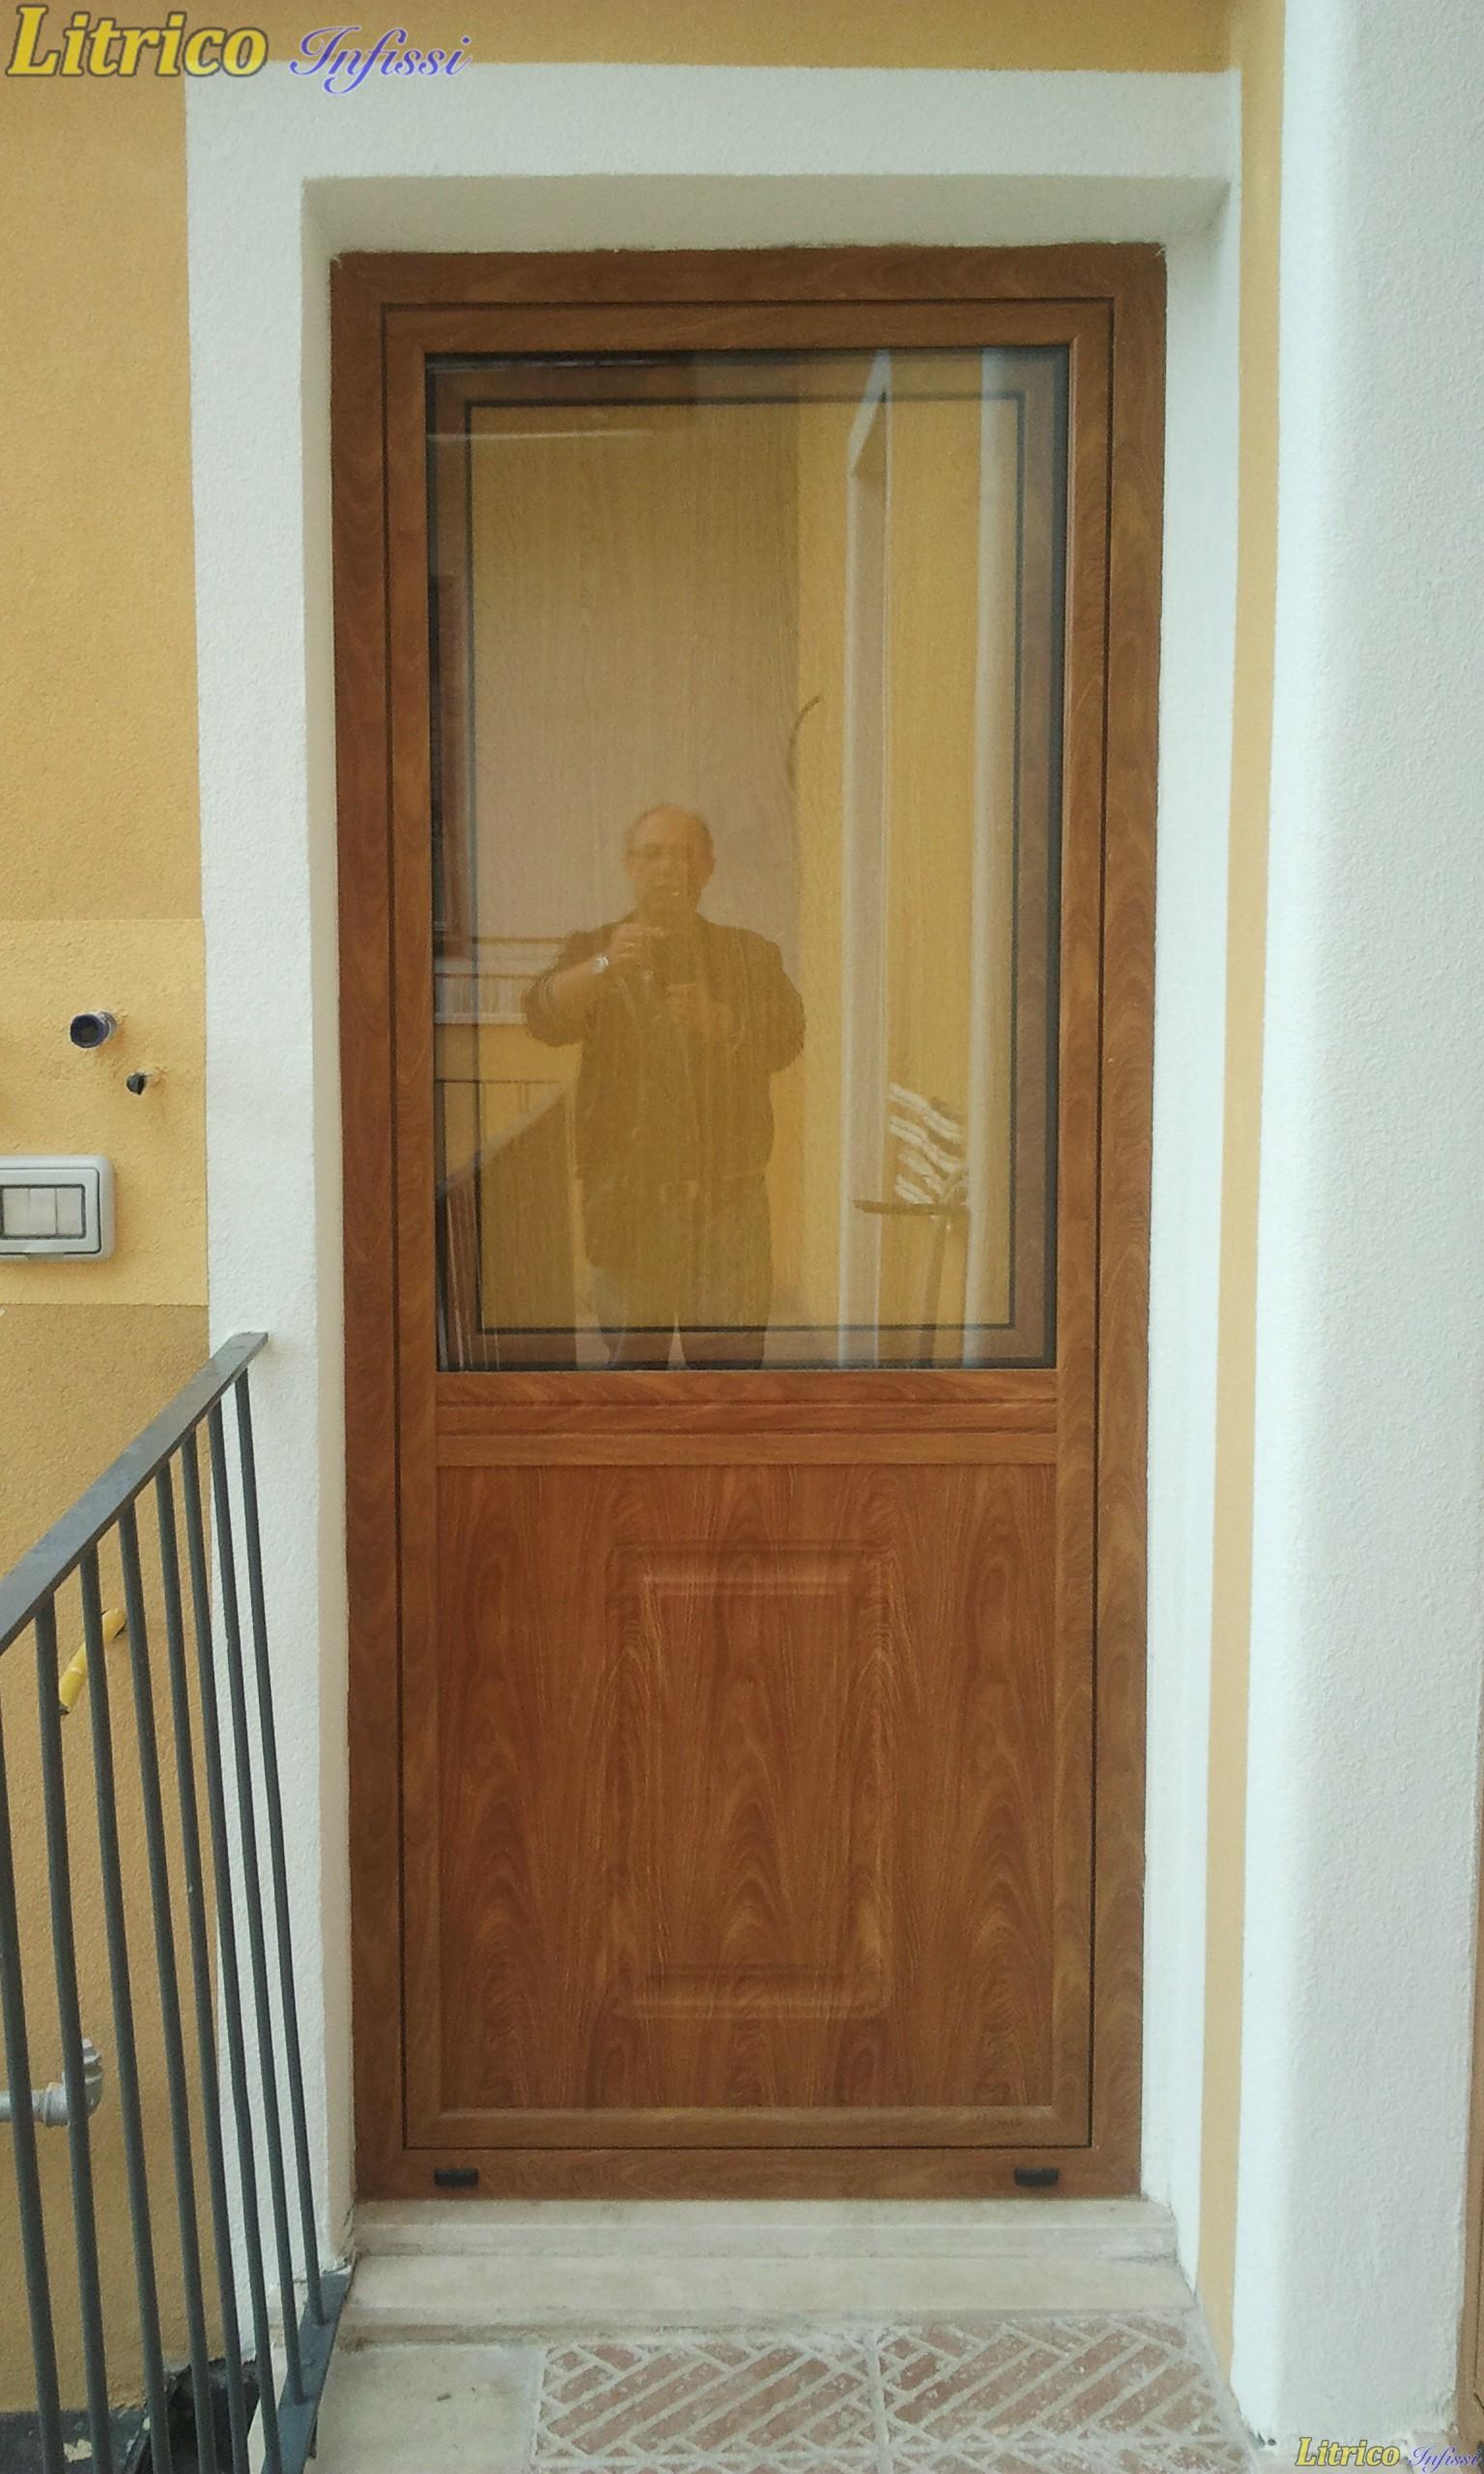 Litrico infissi catania porte finestre - Porte blindate catania ...